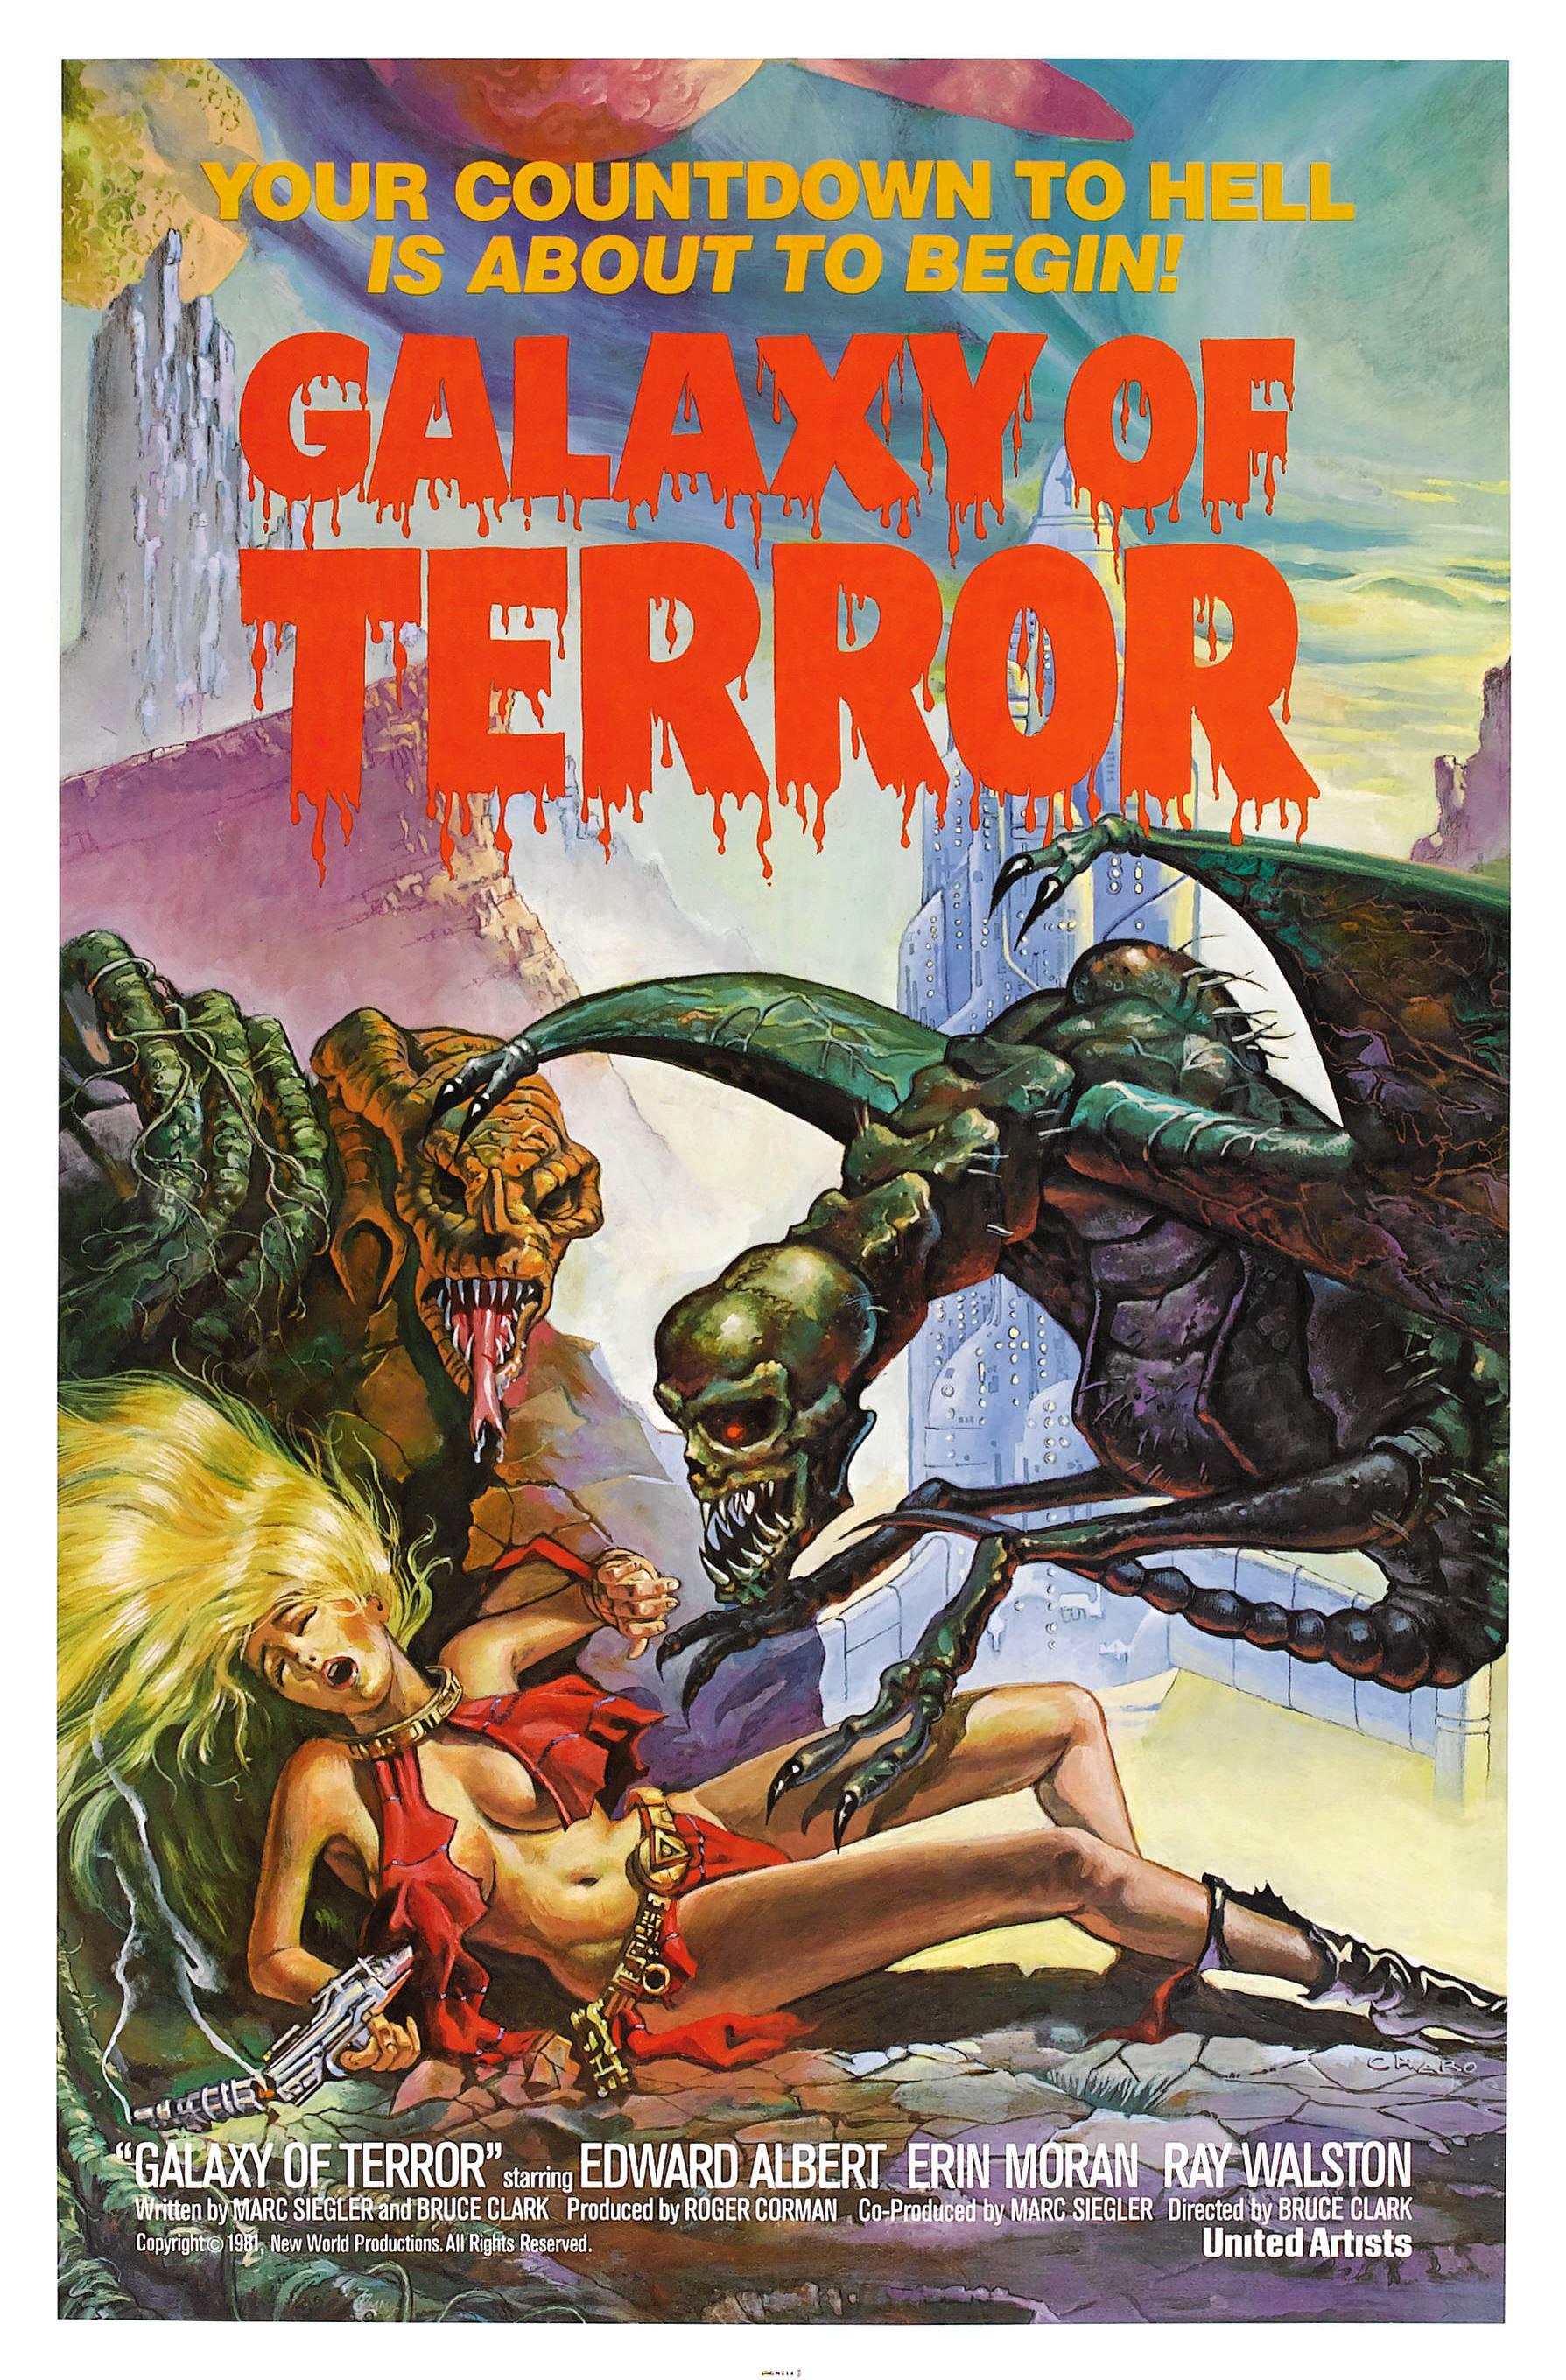 Galaxy of Terror (1981)